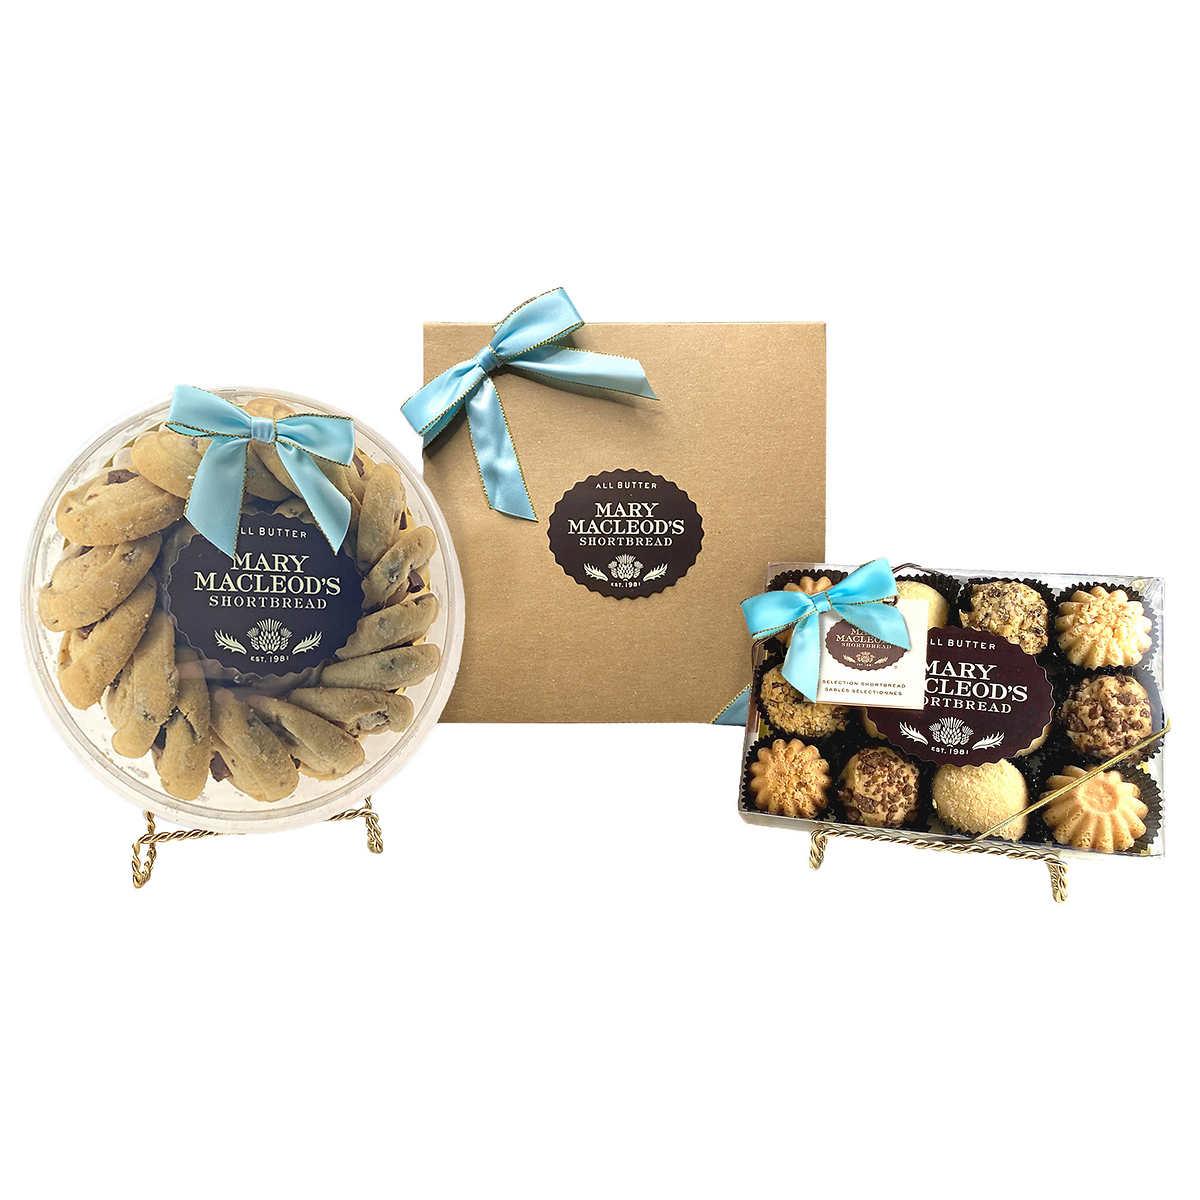 Mary Macleod's Shortbread - Shortbread Cookies Harvest Gift Box